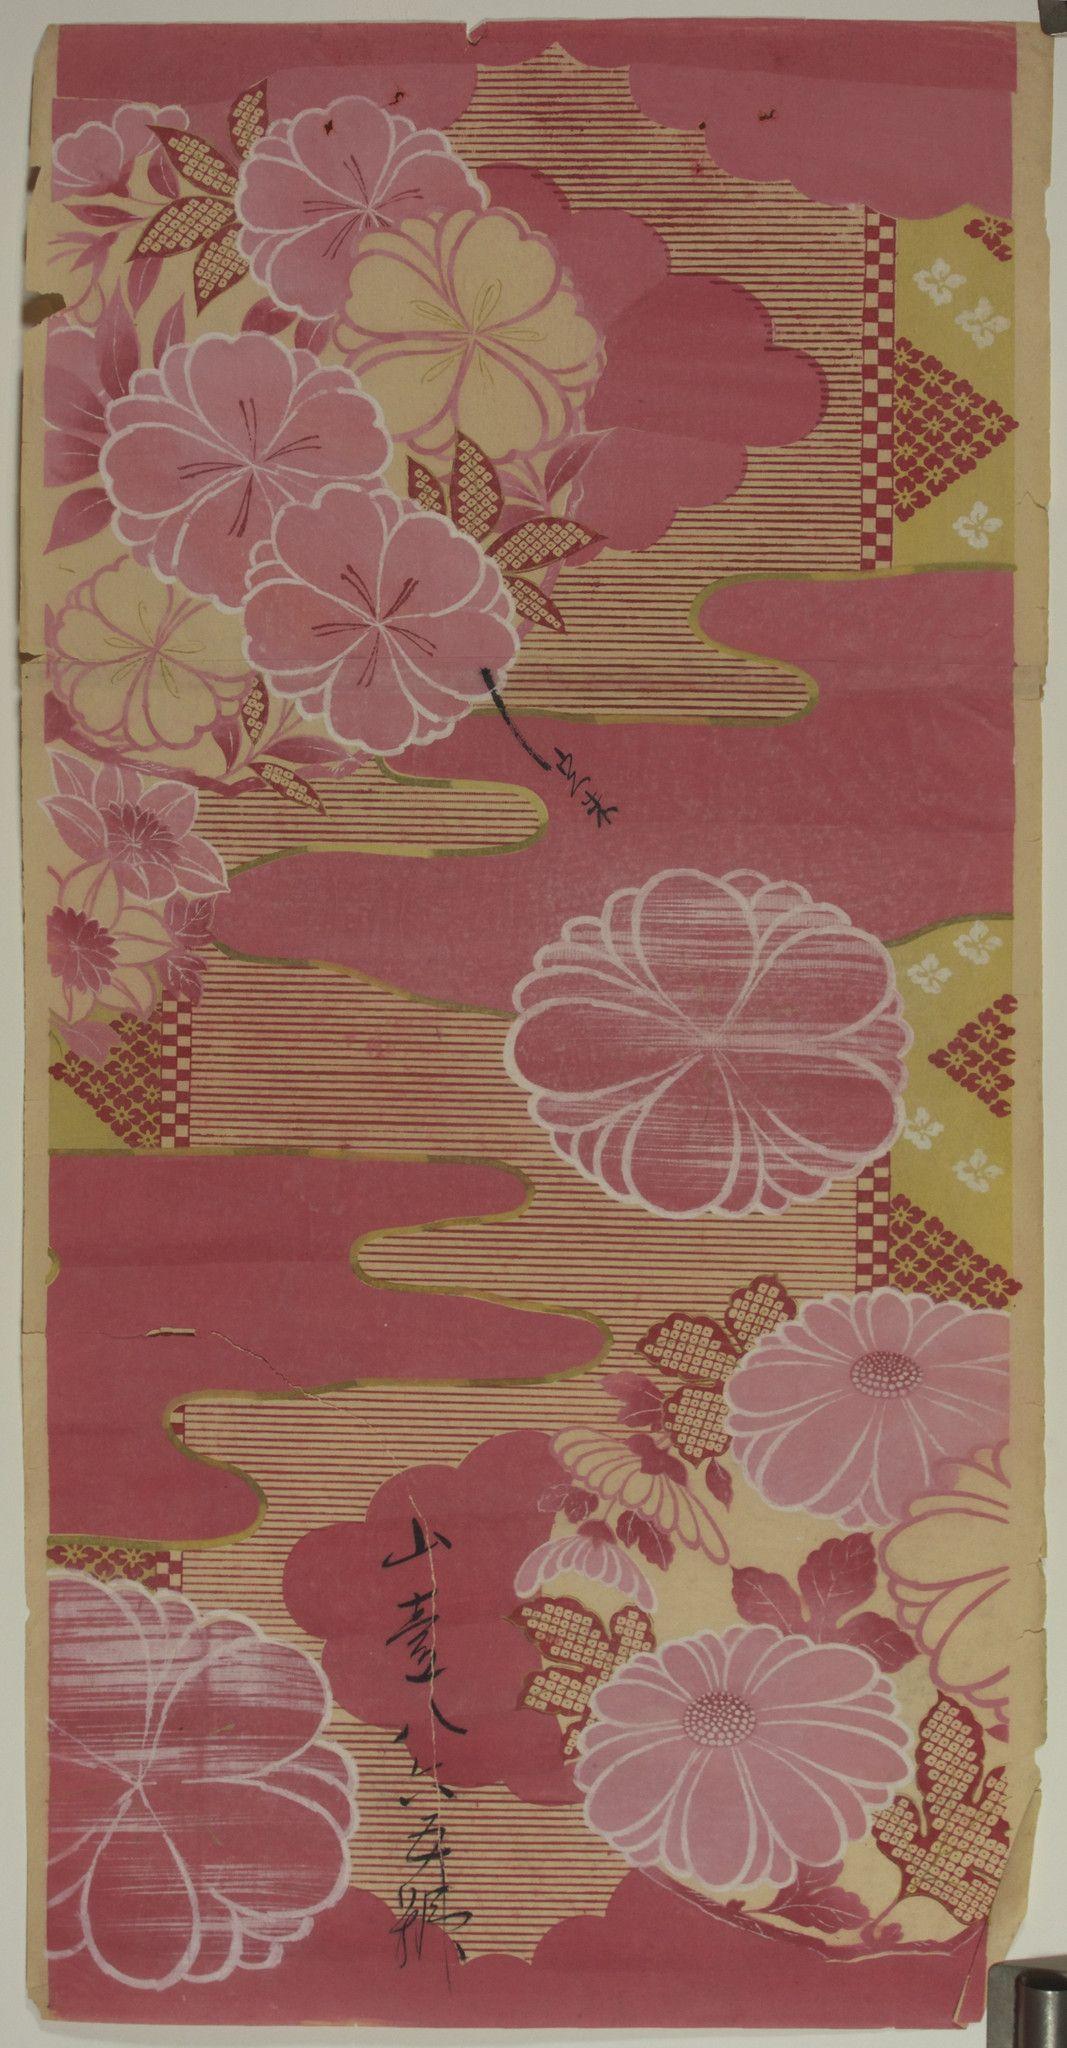 Japanese Textile Design                                                                                                                                                                                 Más